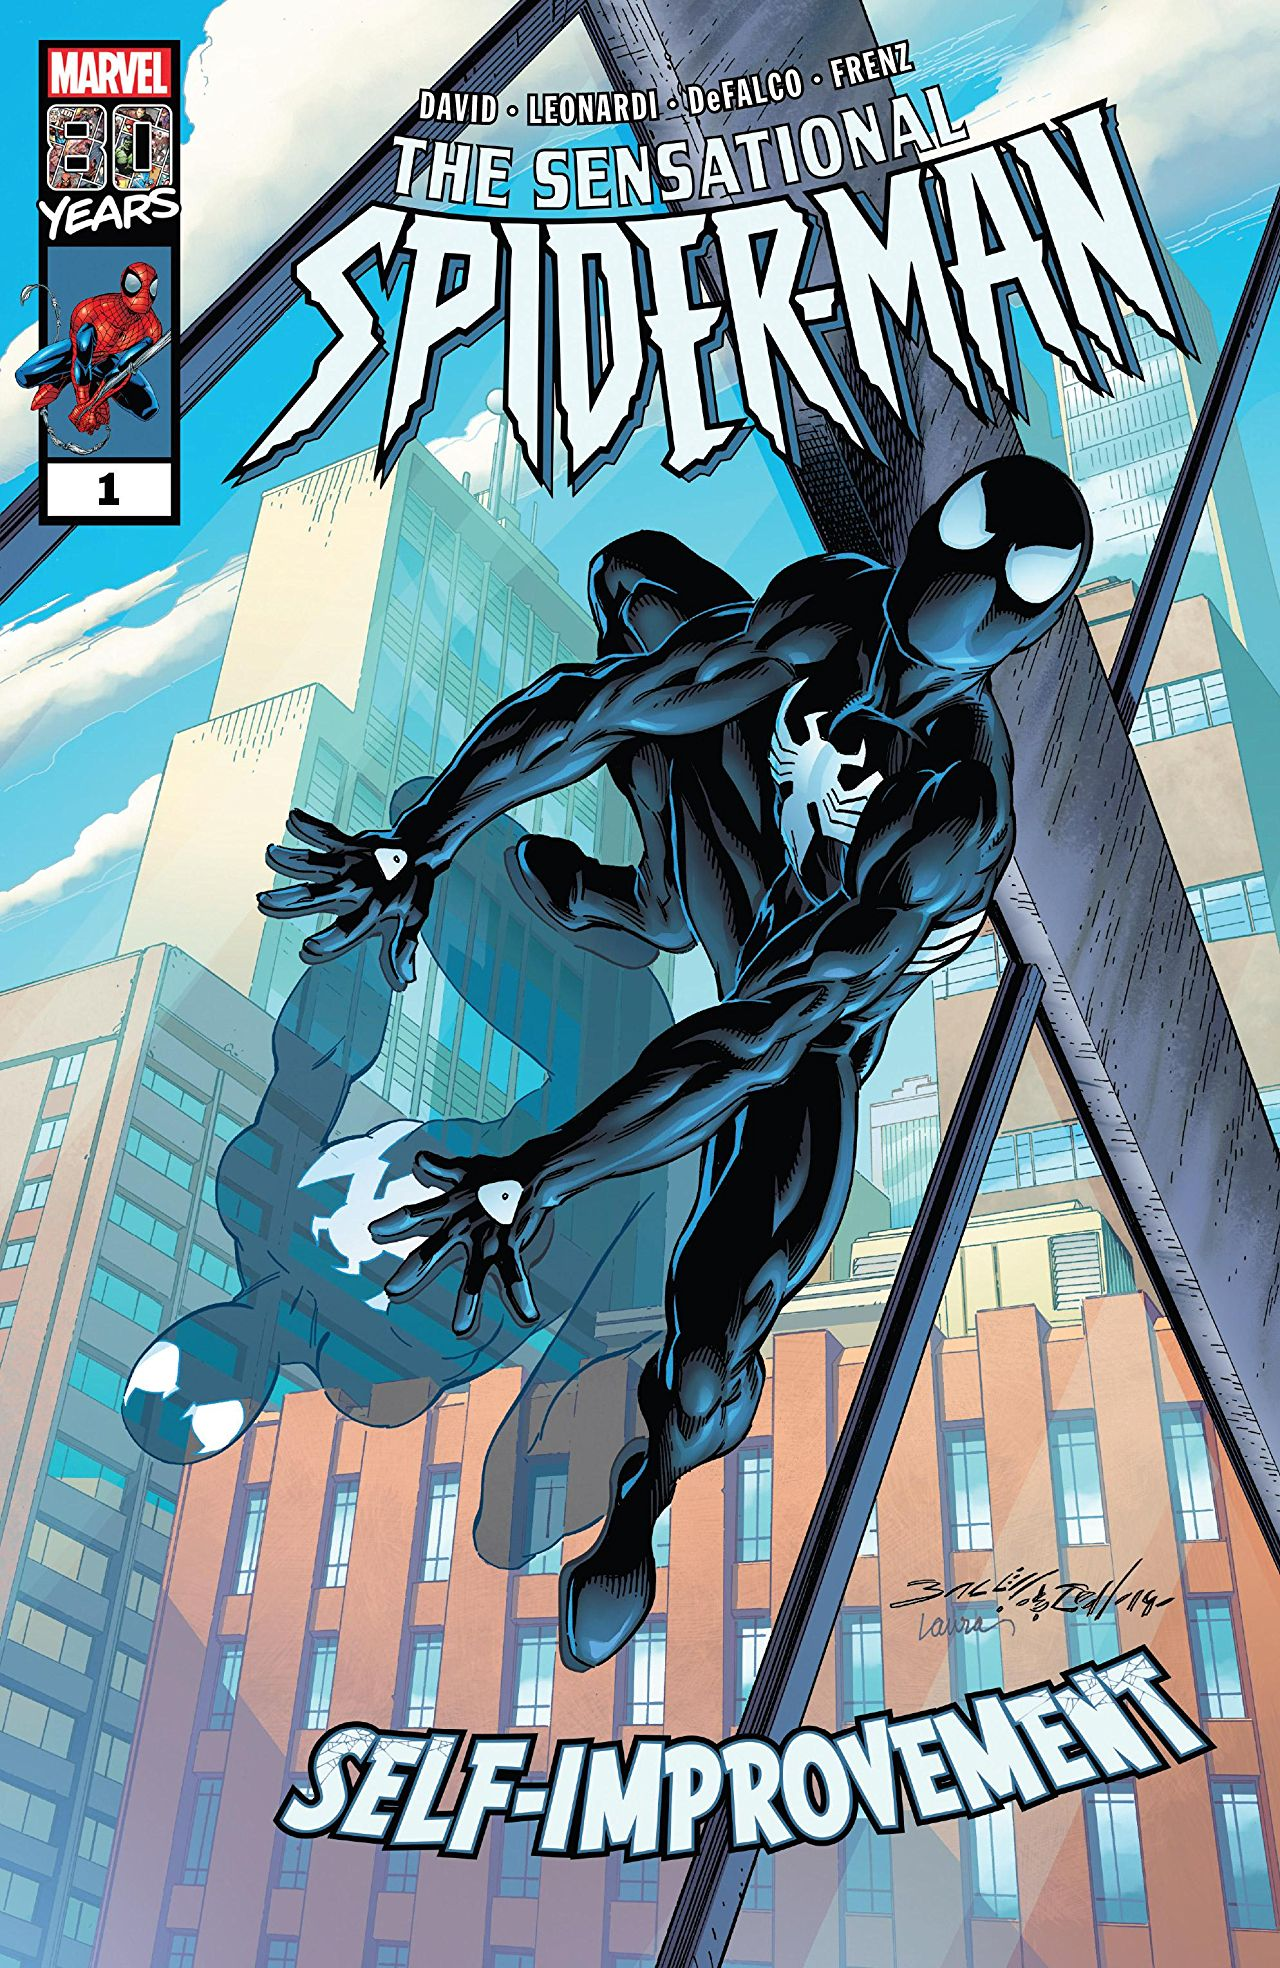 Sensational Spider-Man: Self-Improvement Vol 1